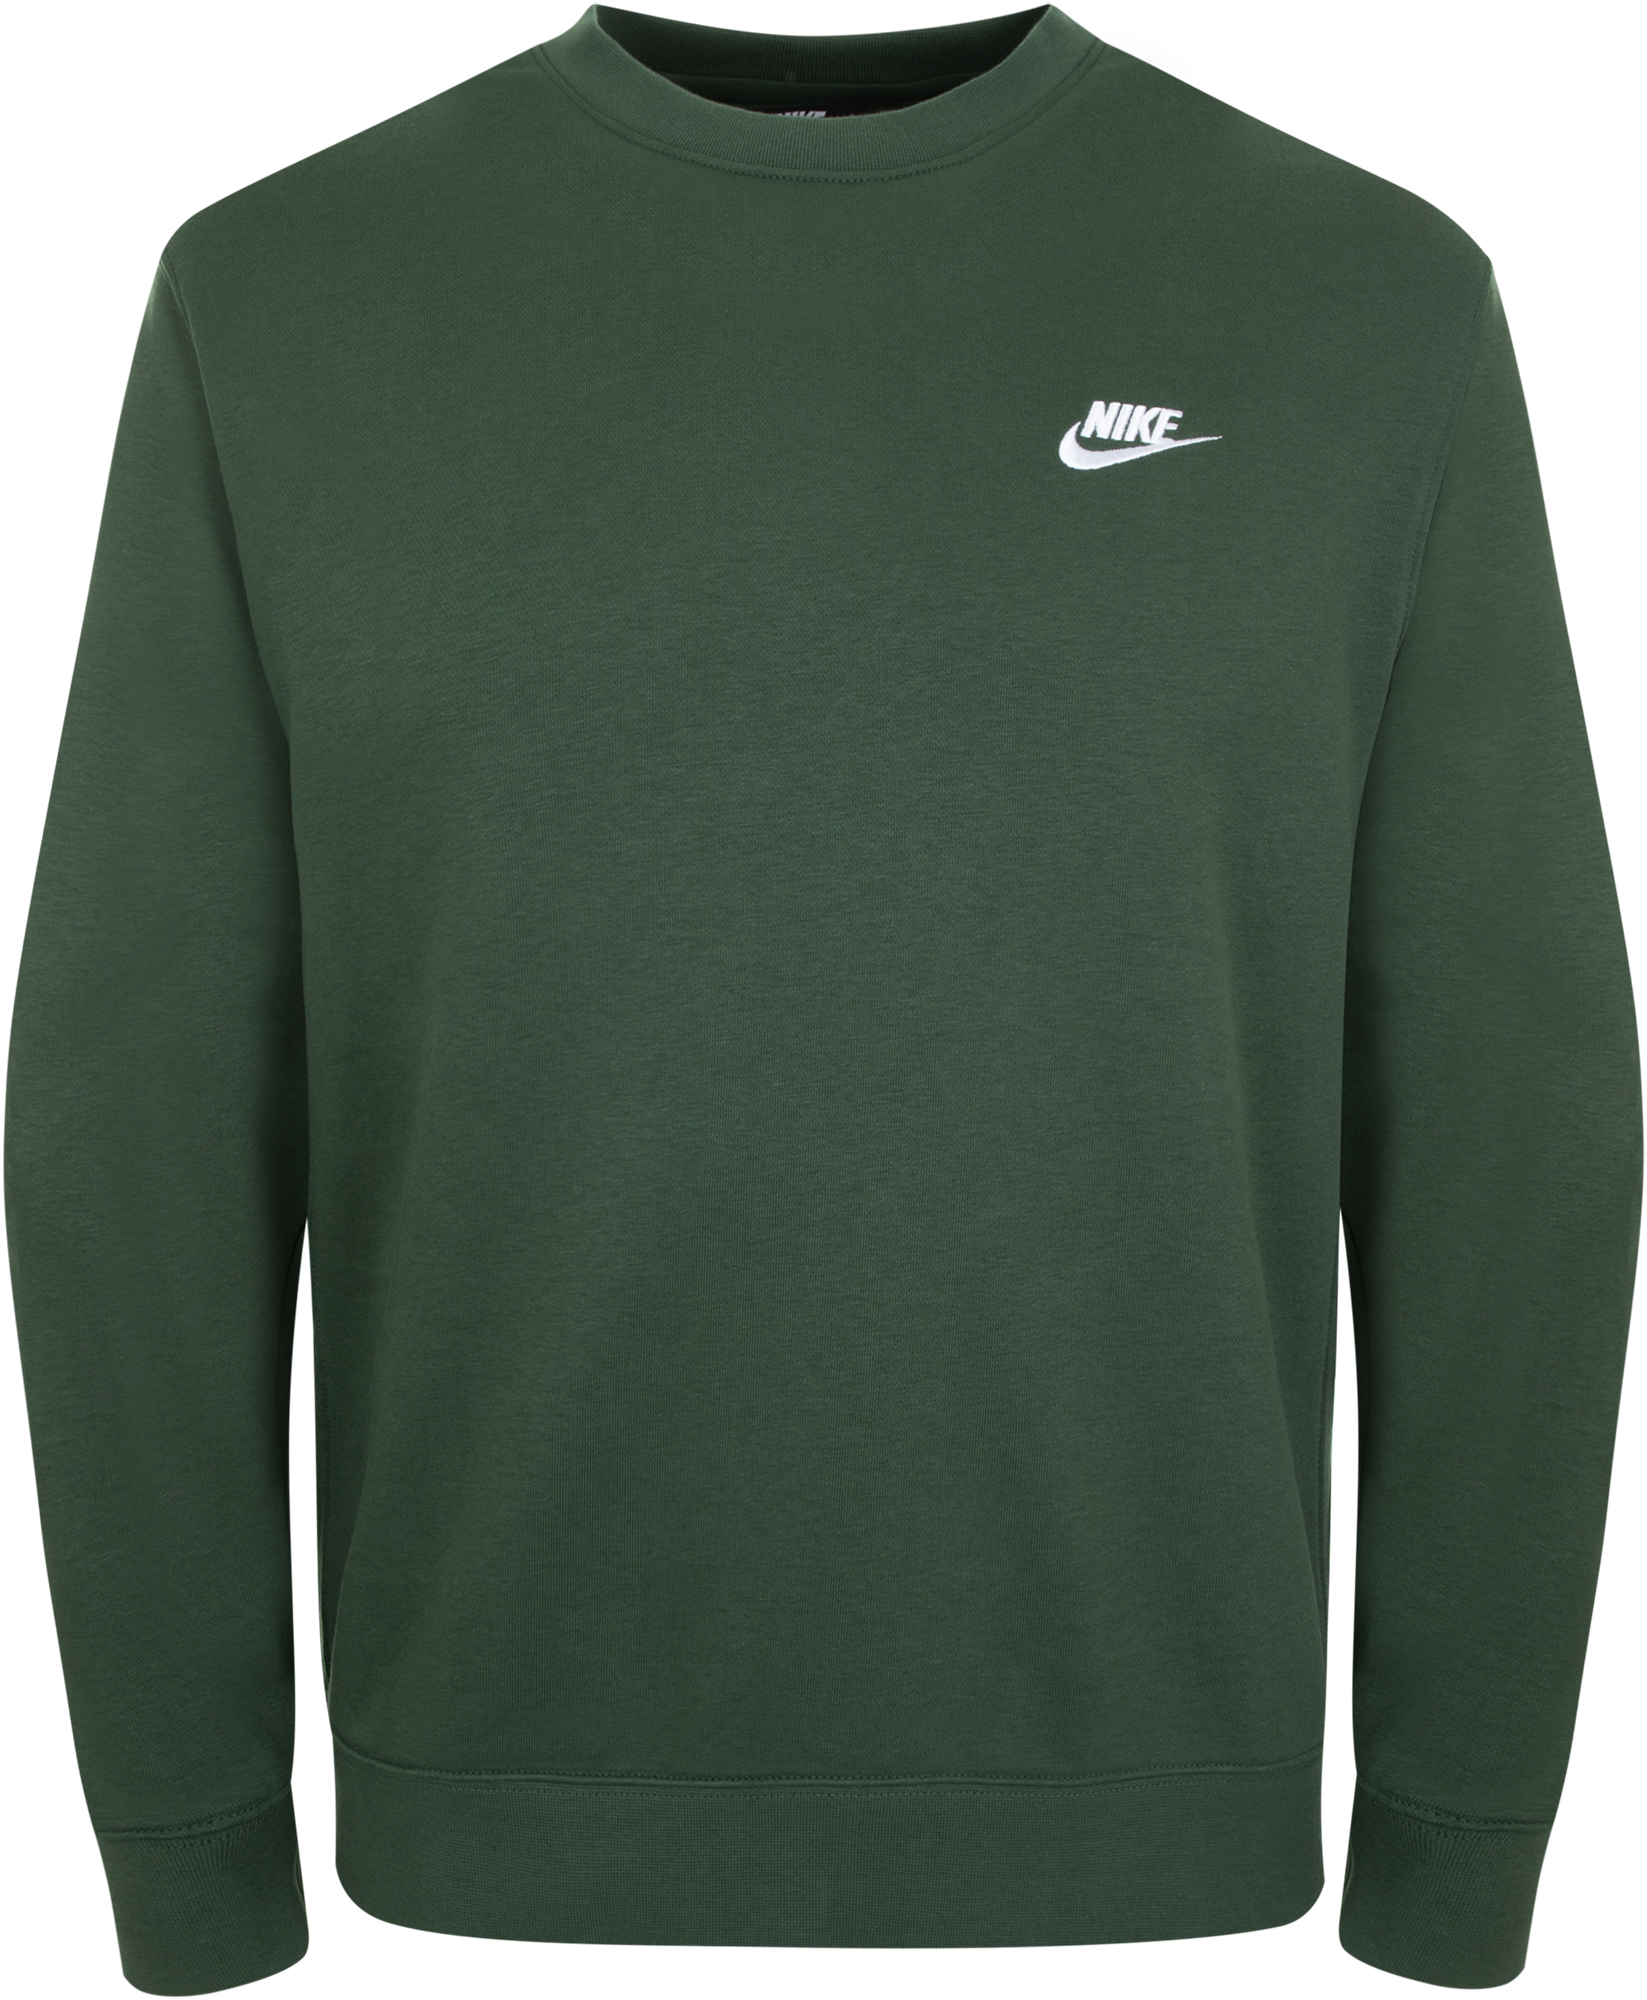 Nike Свитшот мужской Nike Club Crew, размер 52-54 цена в Москве и Питере